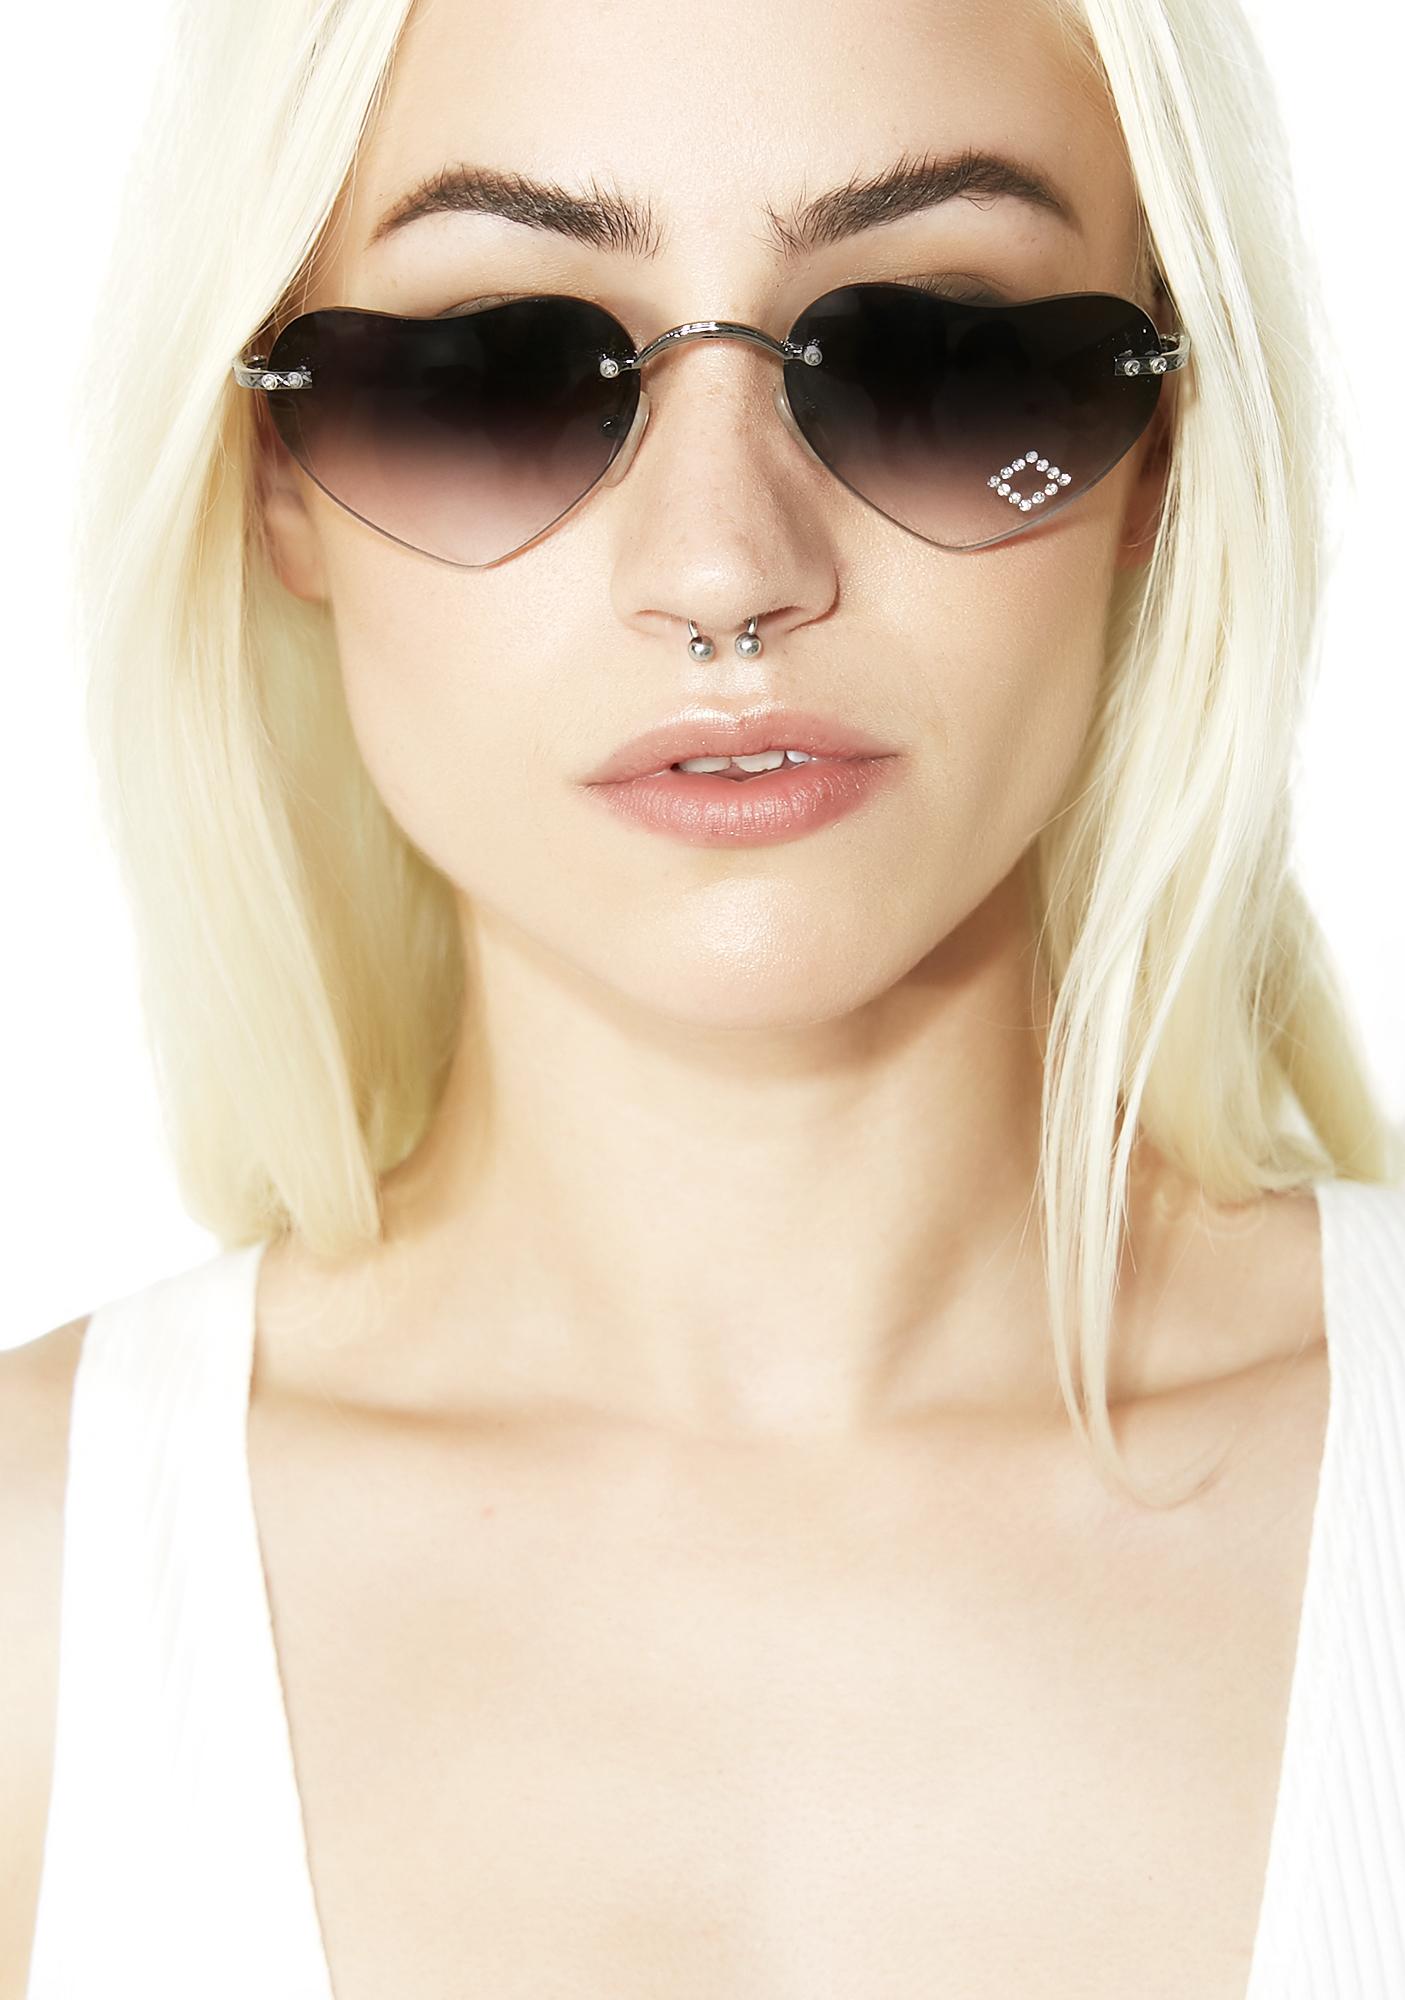 Lolita Heart Tinted Sunglasses Black